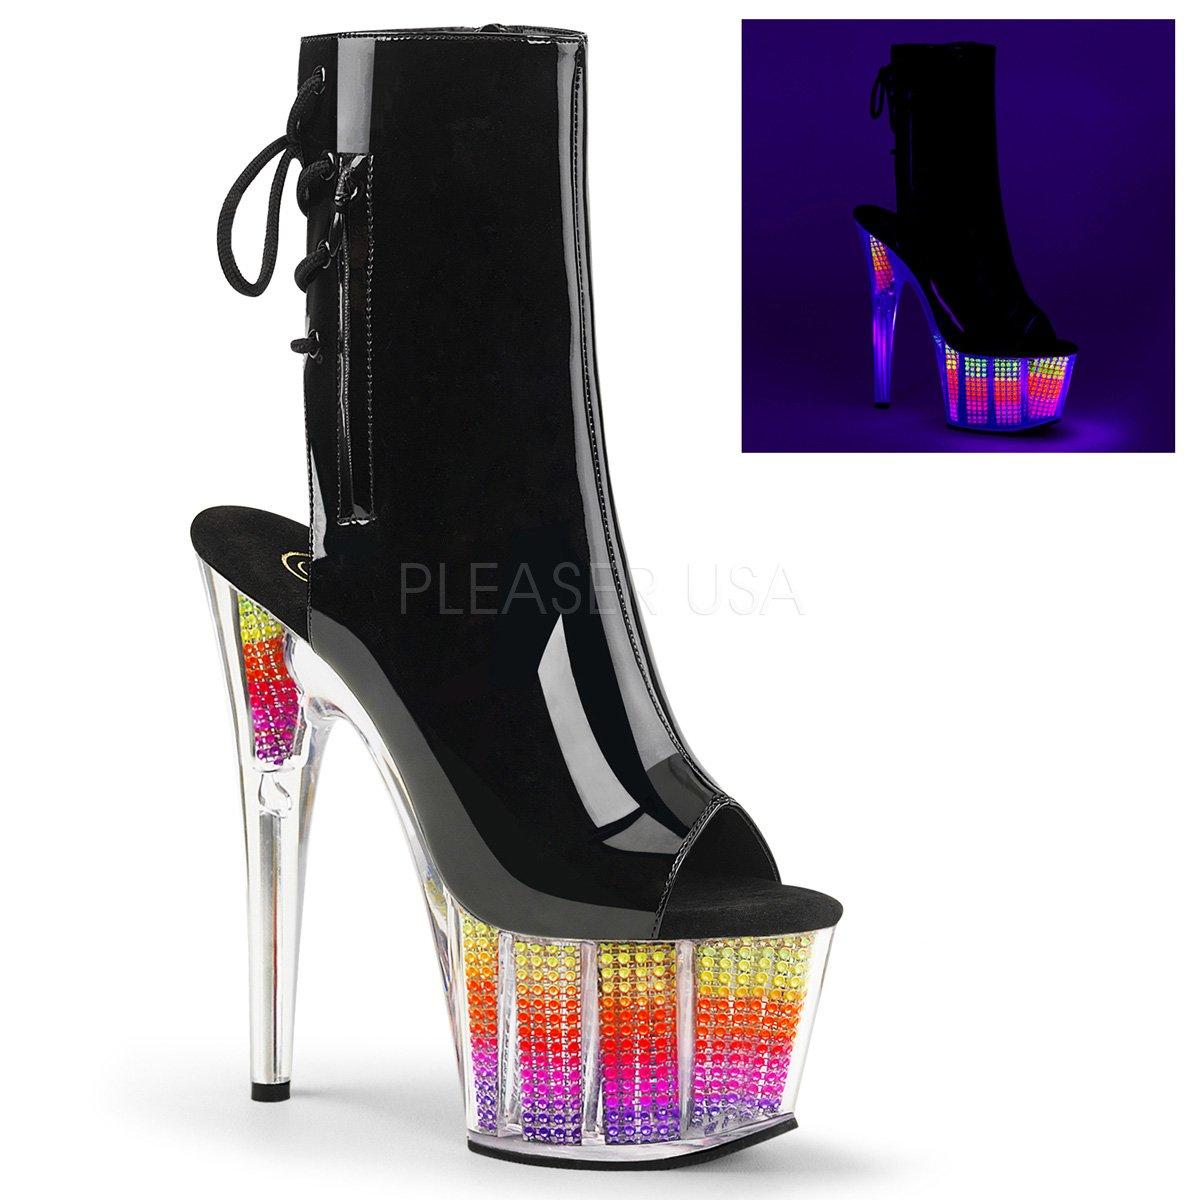 Pleaser Women's Ado1018srs/Bpu/Nmc Ankle Bootie B01N5T41MS 7 B(M) US|Blk Pat/Neon Multi Srs